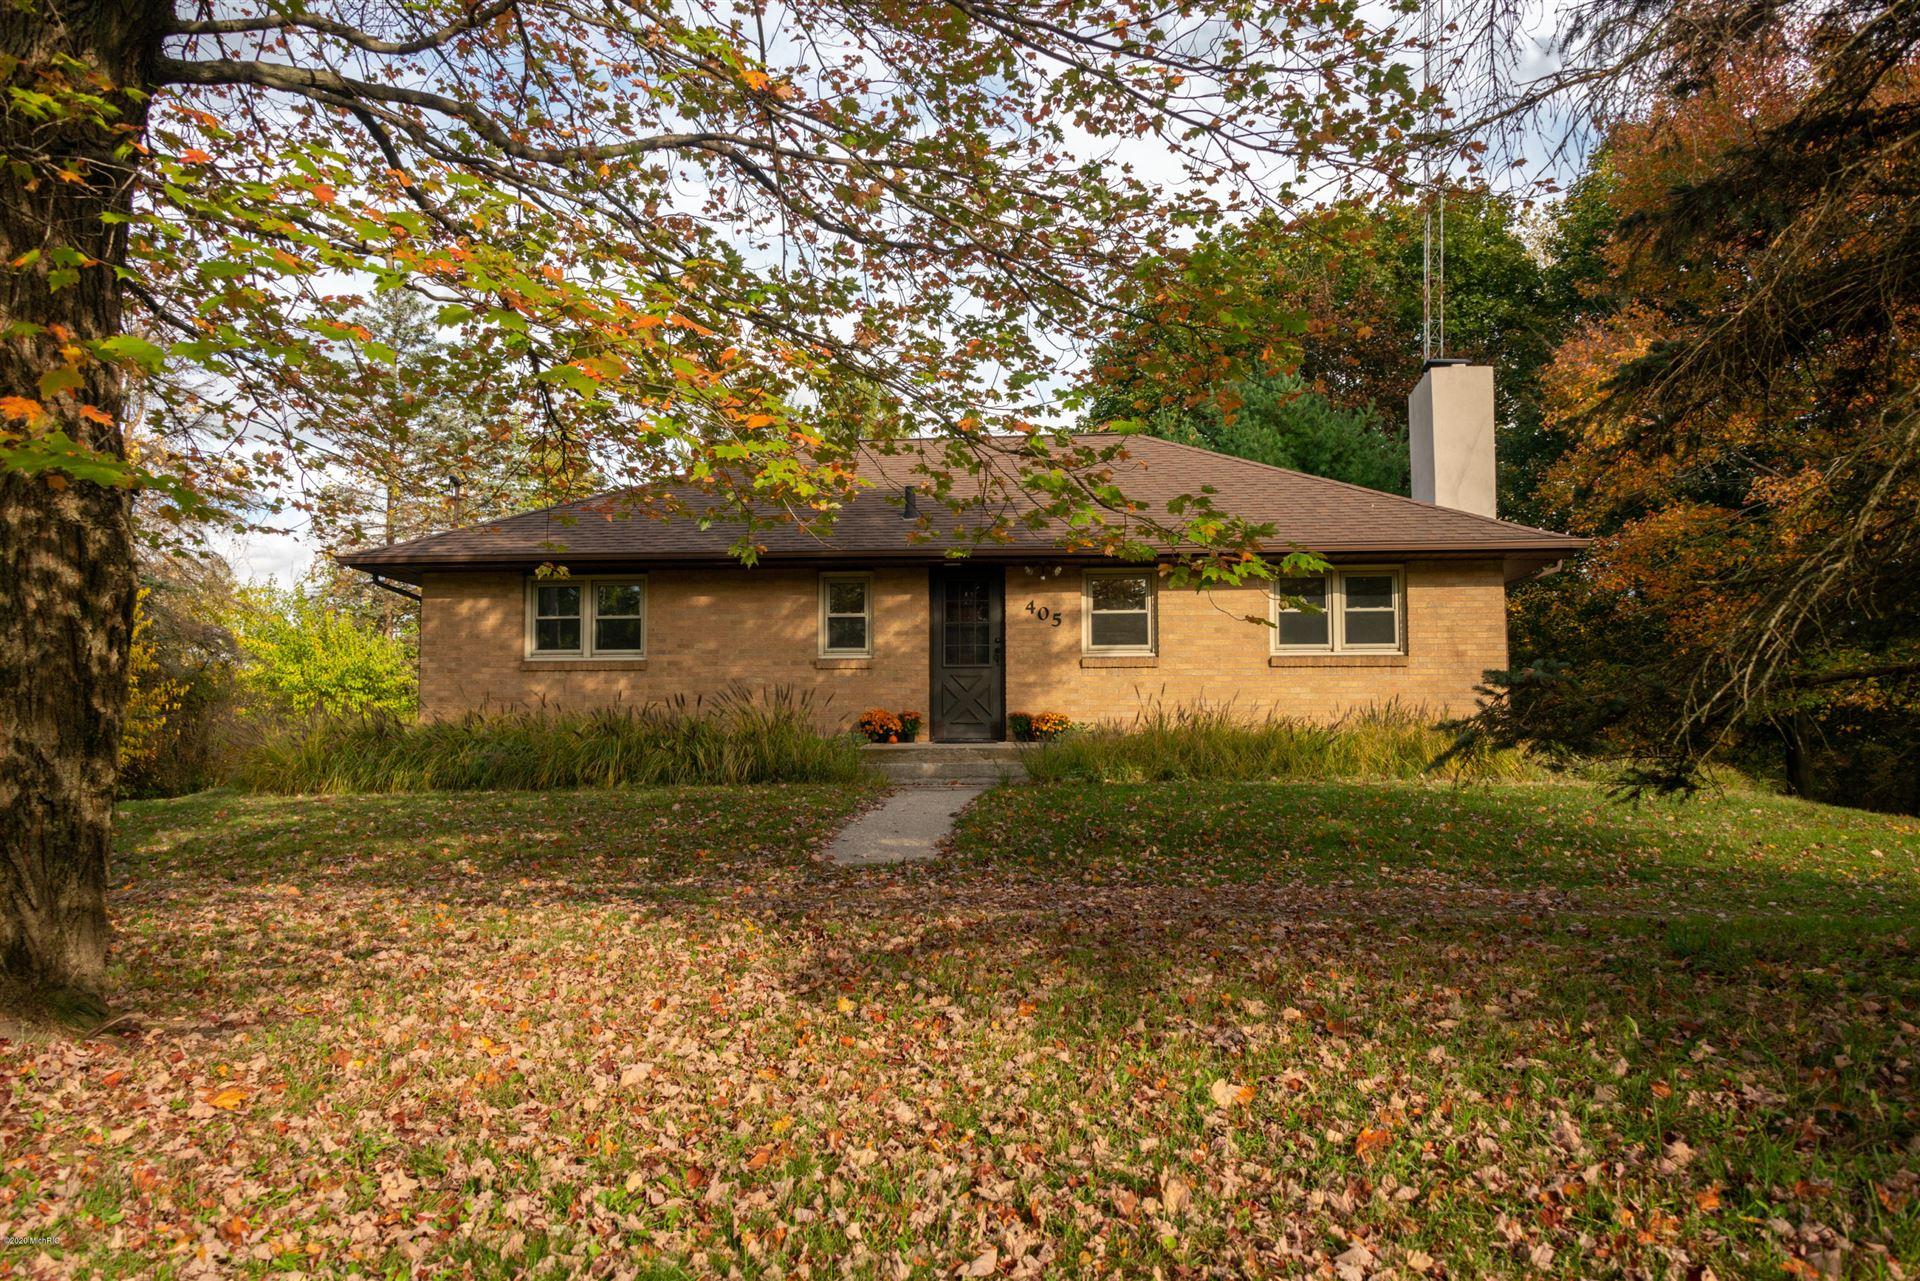 405 S Park Road, Benton Harbor, MI 49022 - MLS#: 20044630